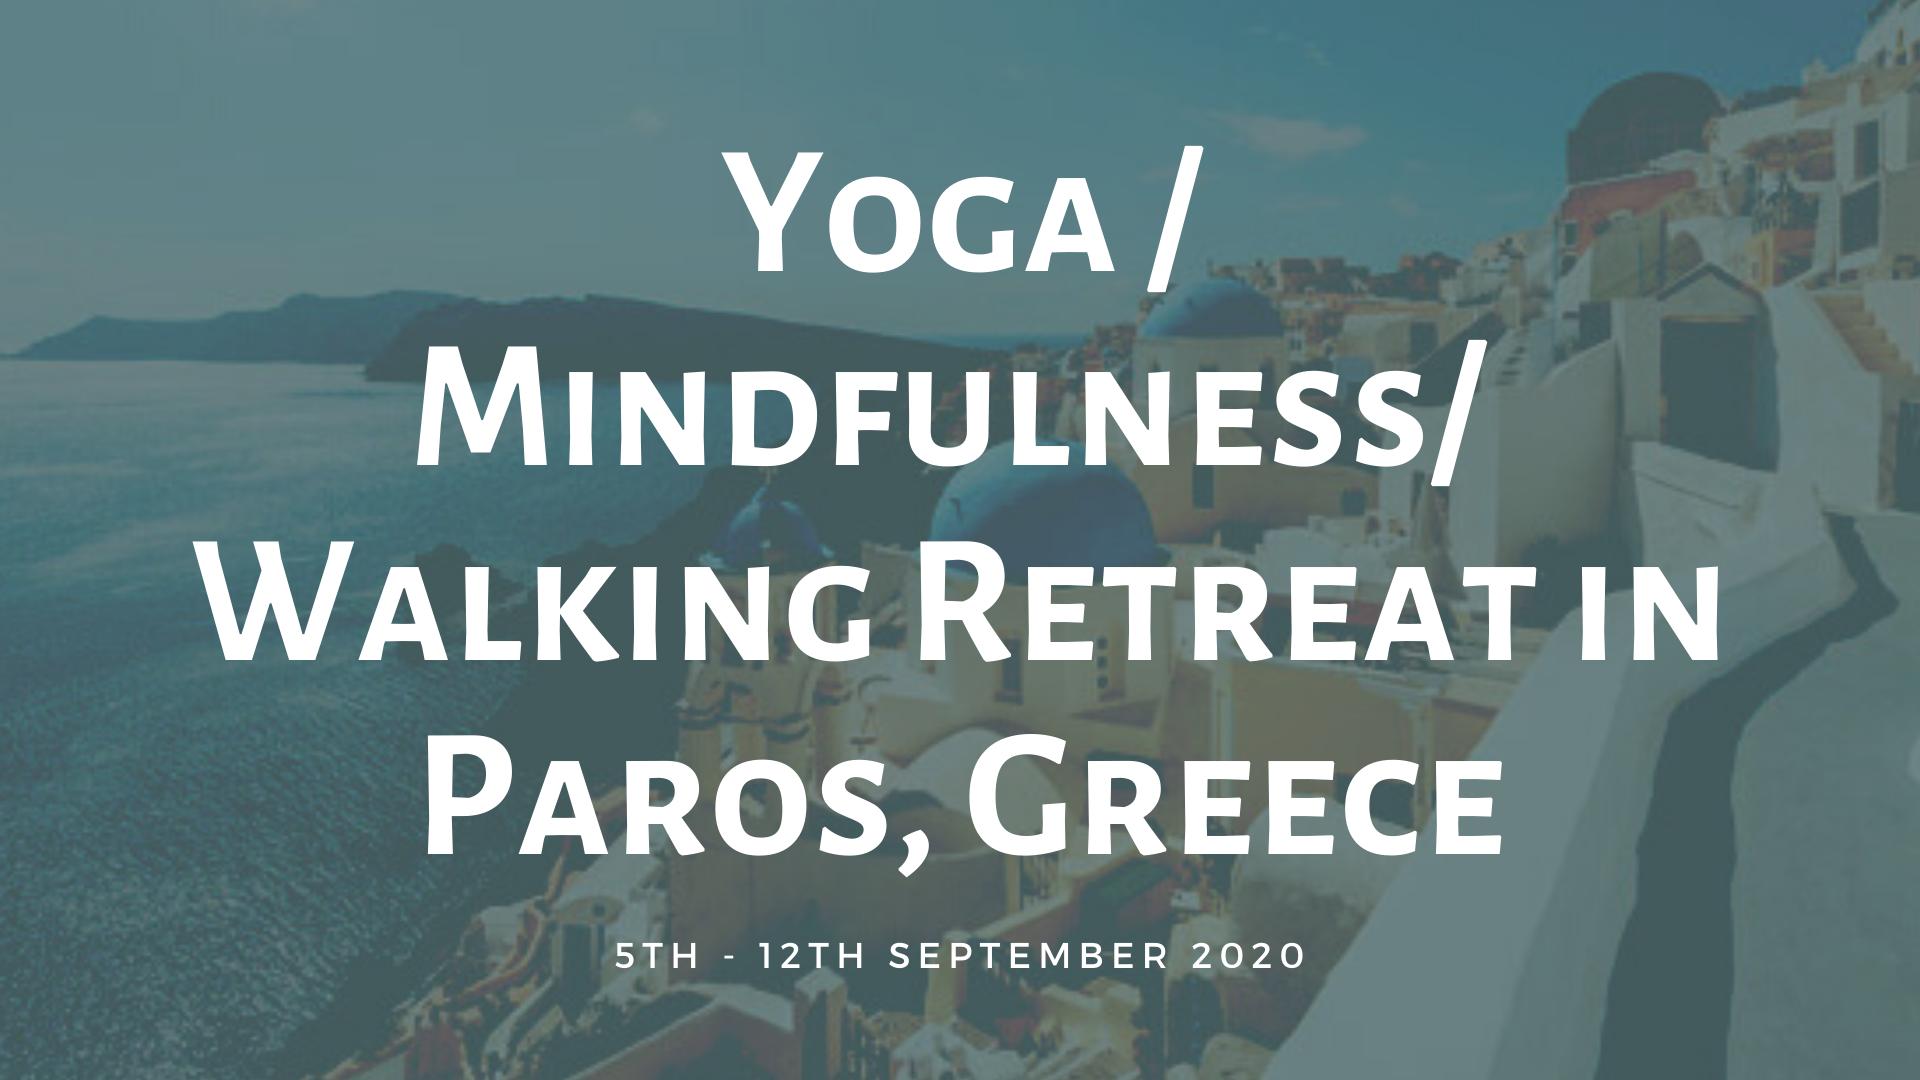 Yoga - Mindfulness - Walking Retreat in